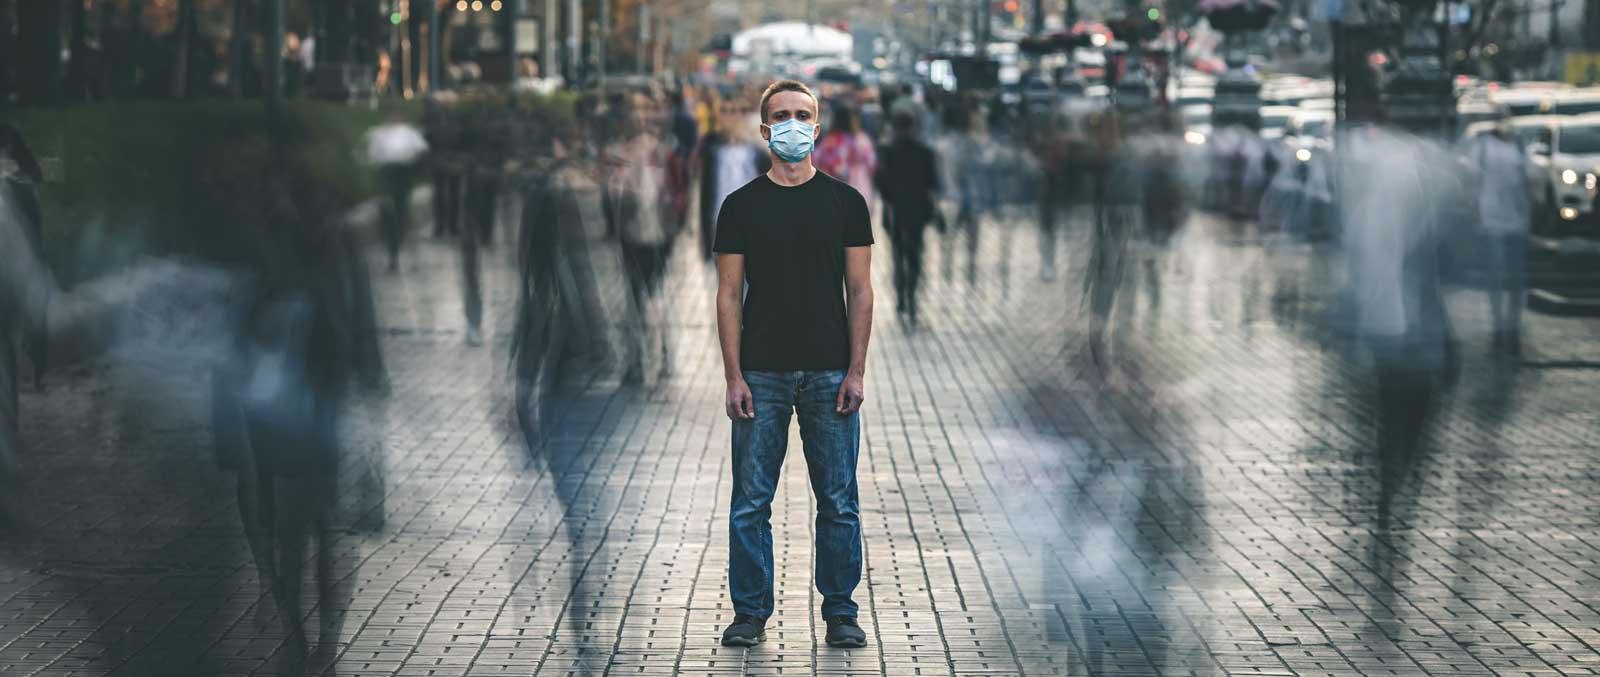 Man in Sydney street wearing mask - Coronavirus Lockdowns